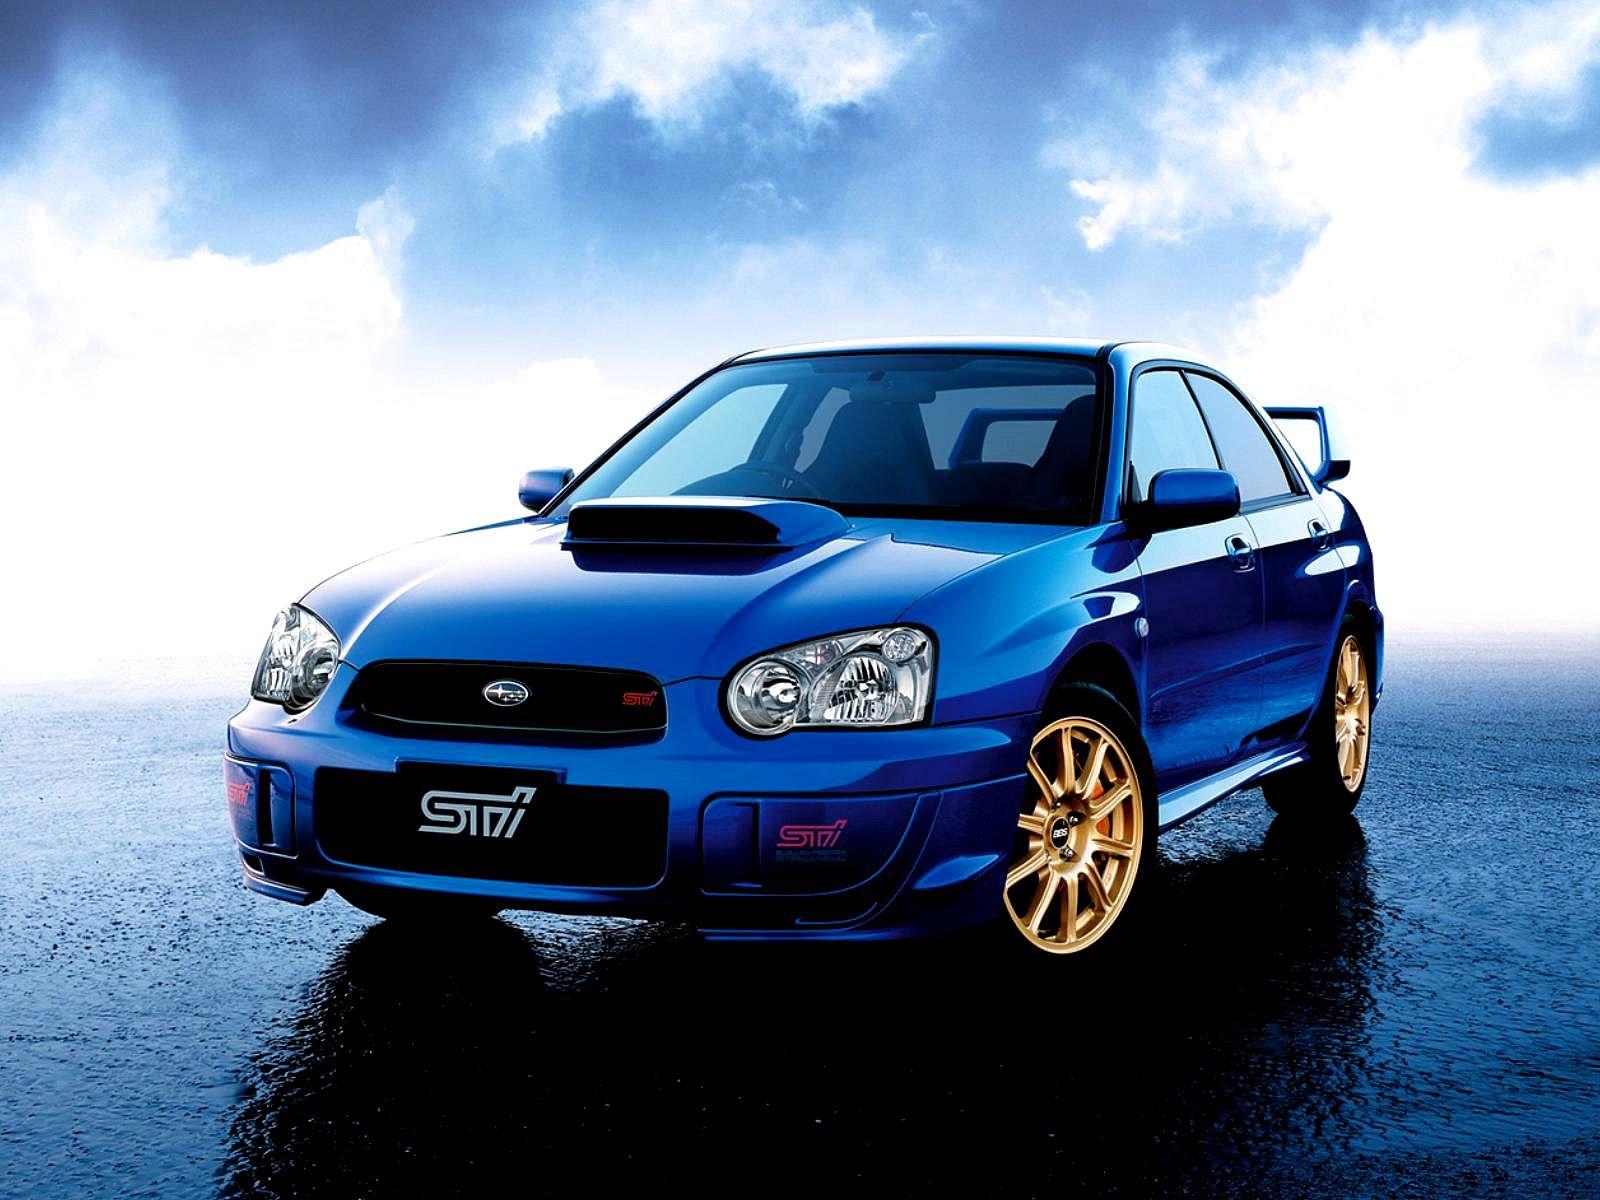 Subaru Impreza Wallpapers Hd Wallpapers Base Impreza Wrx